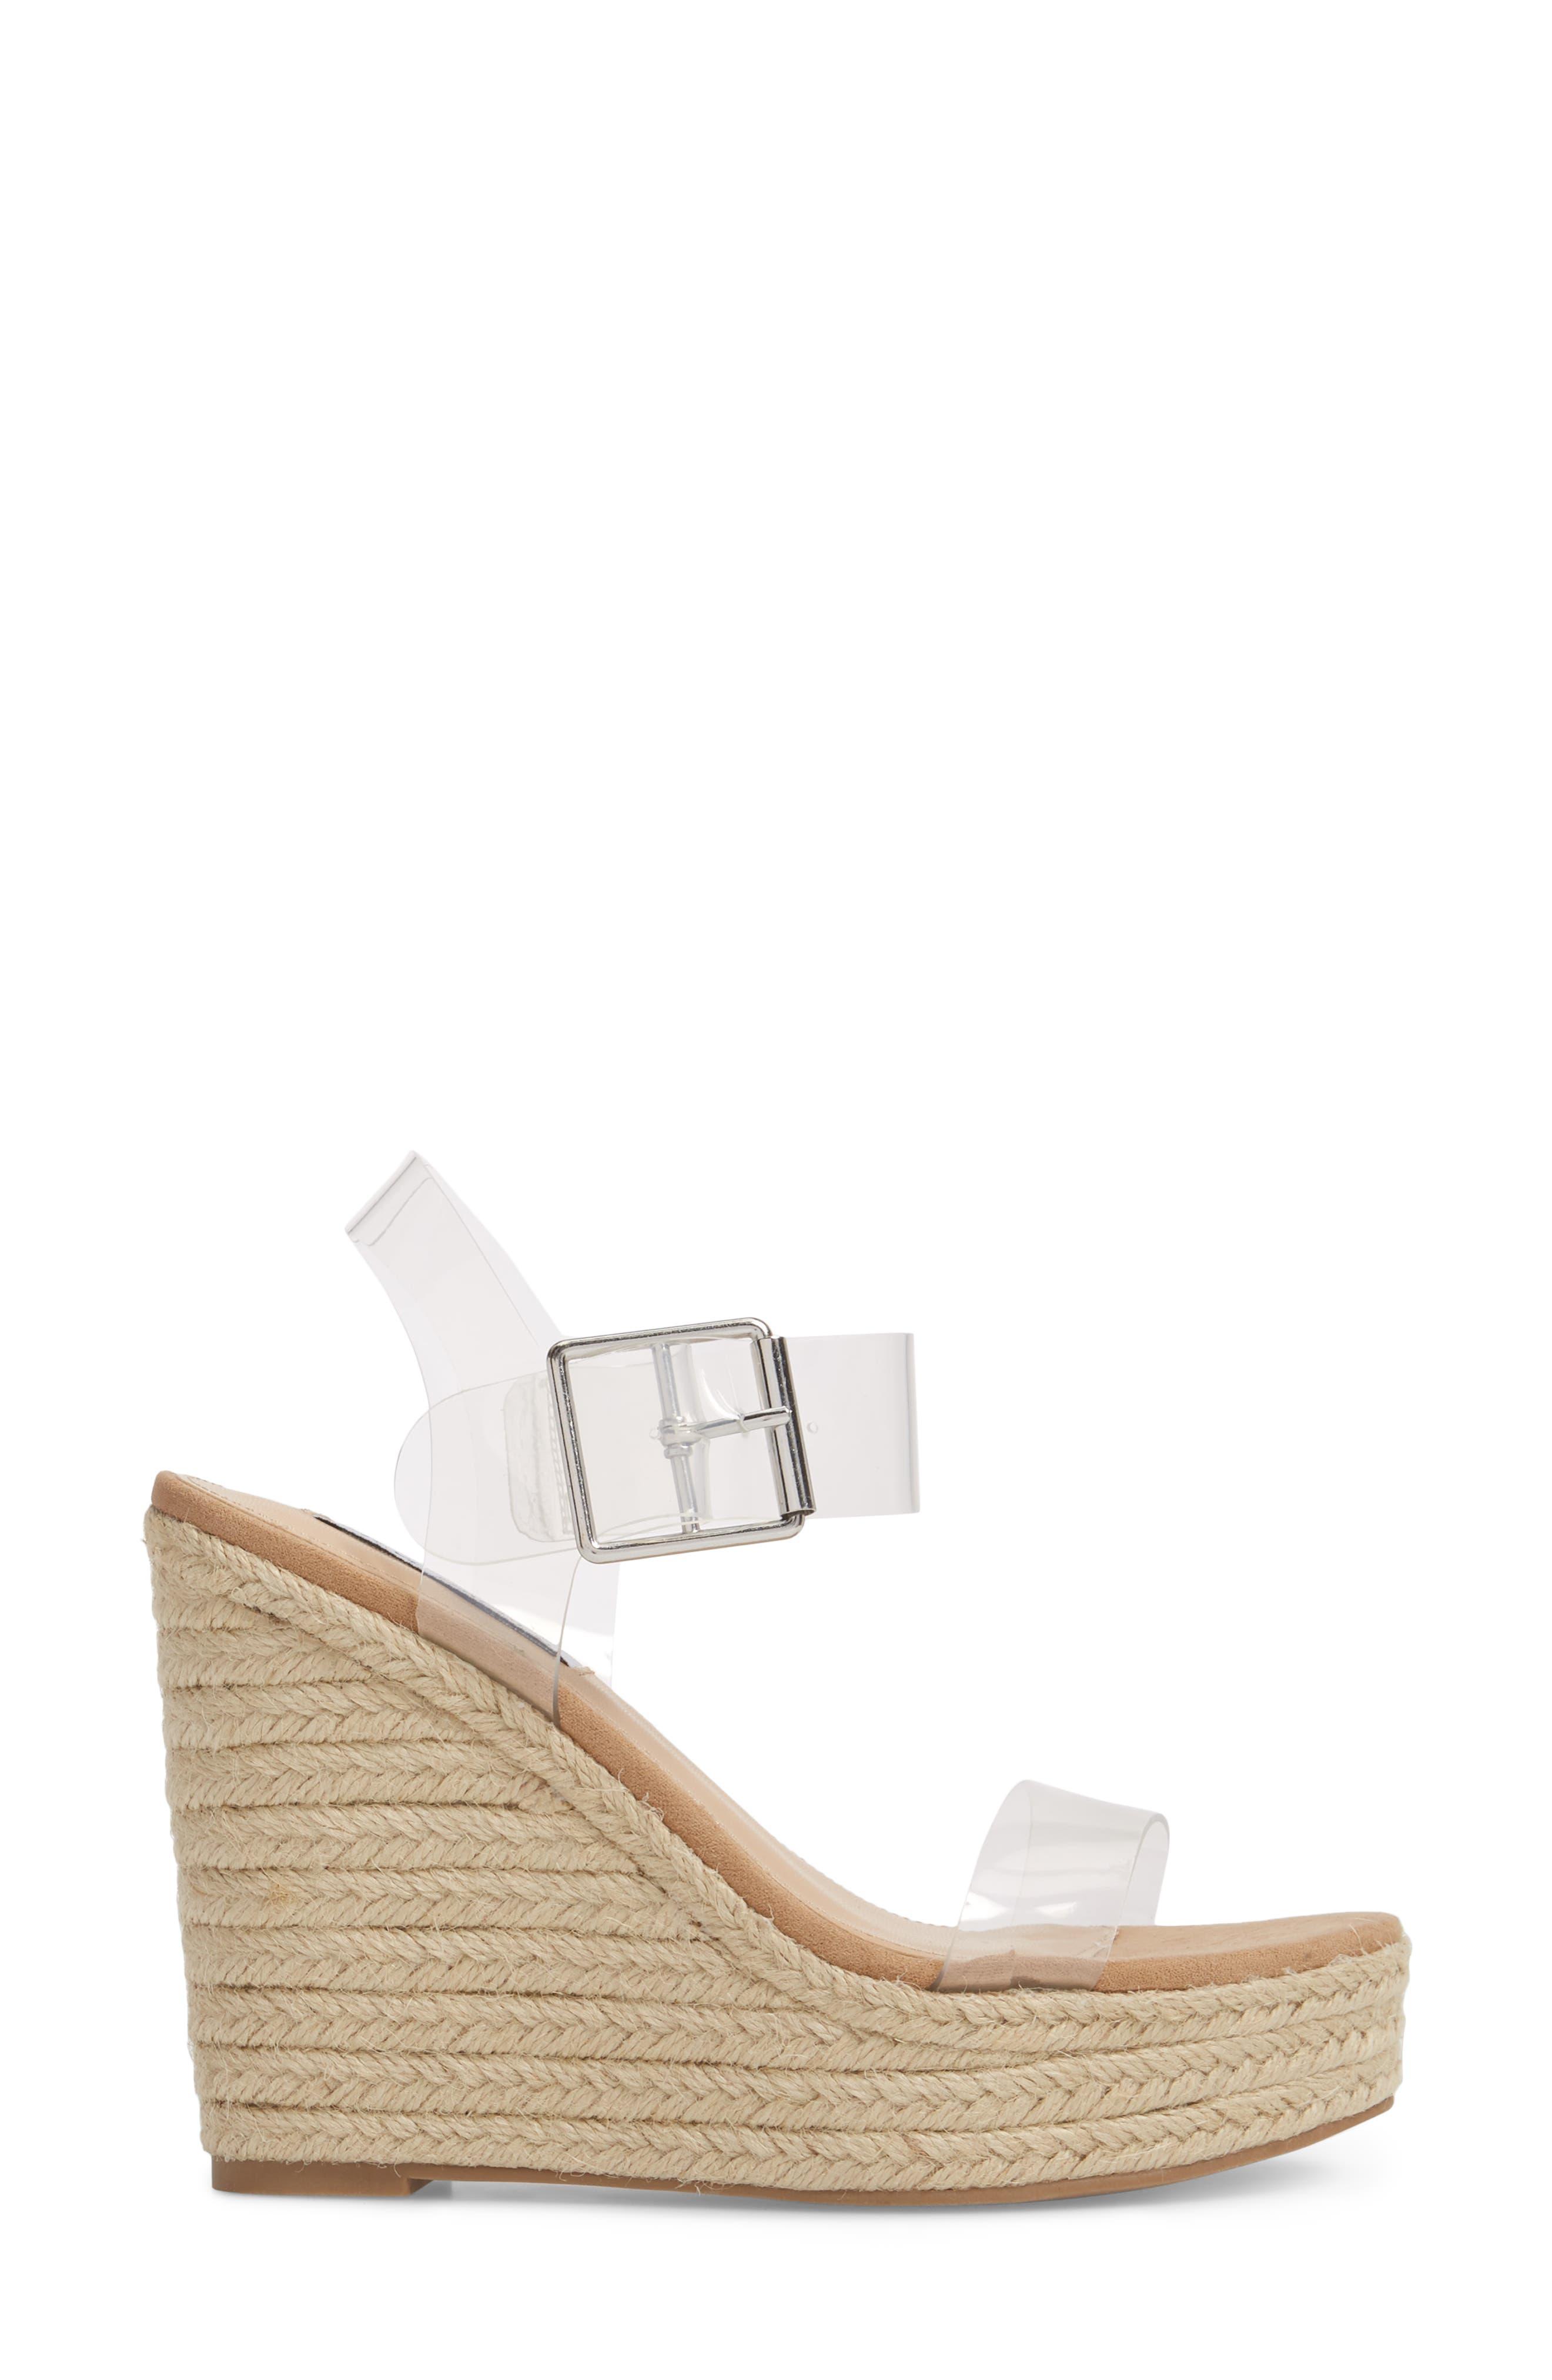 Splash Transparent Strap Wedge Sandal,                             Alternate thumbnail 3, color,                             250